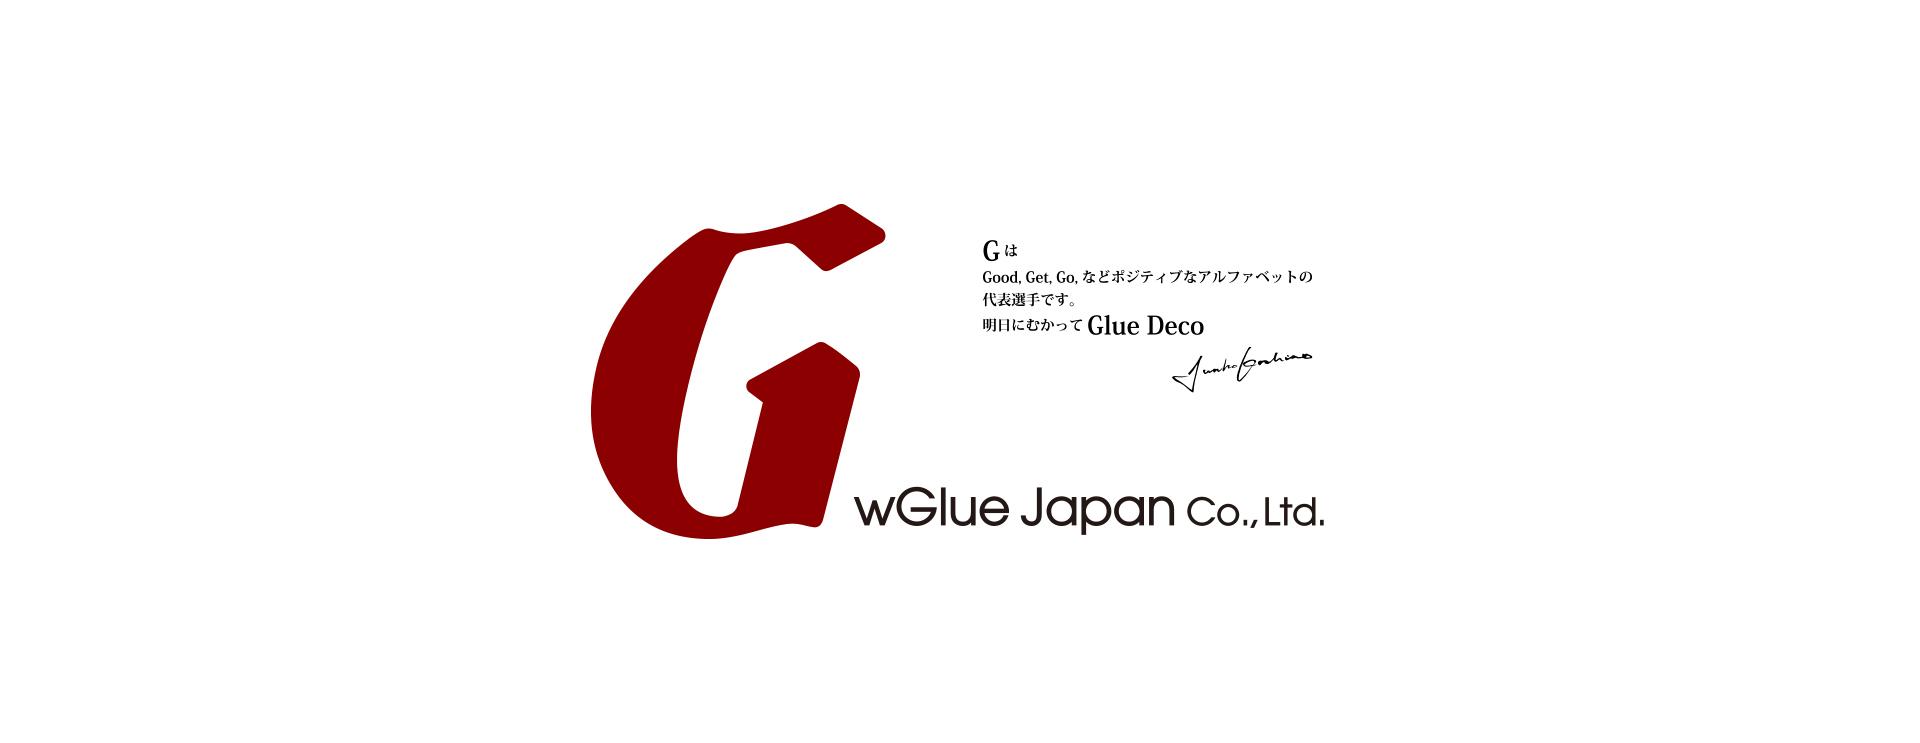 wGlue Japanイメージ1